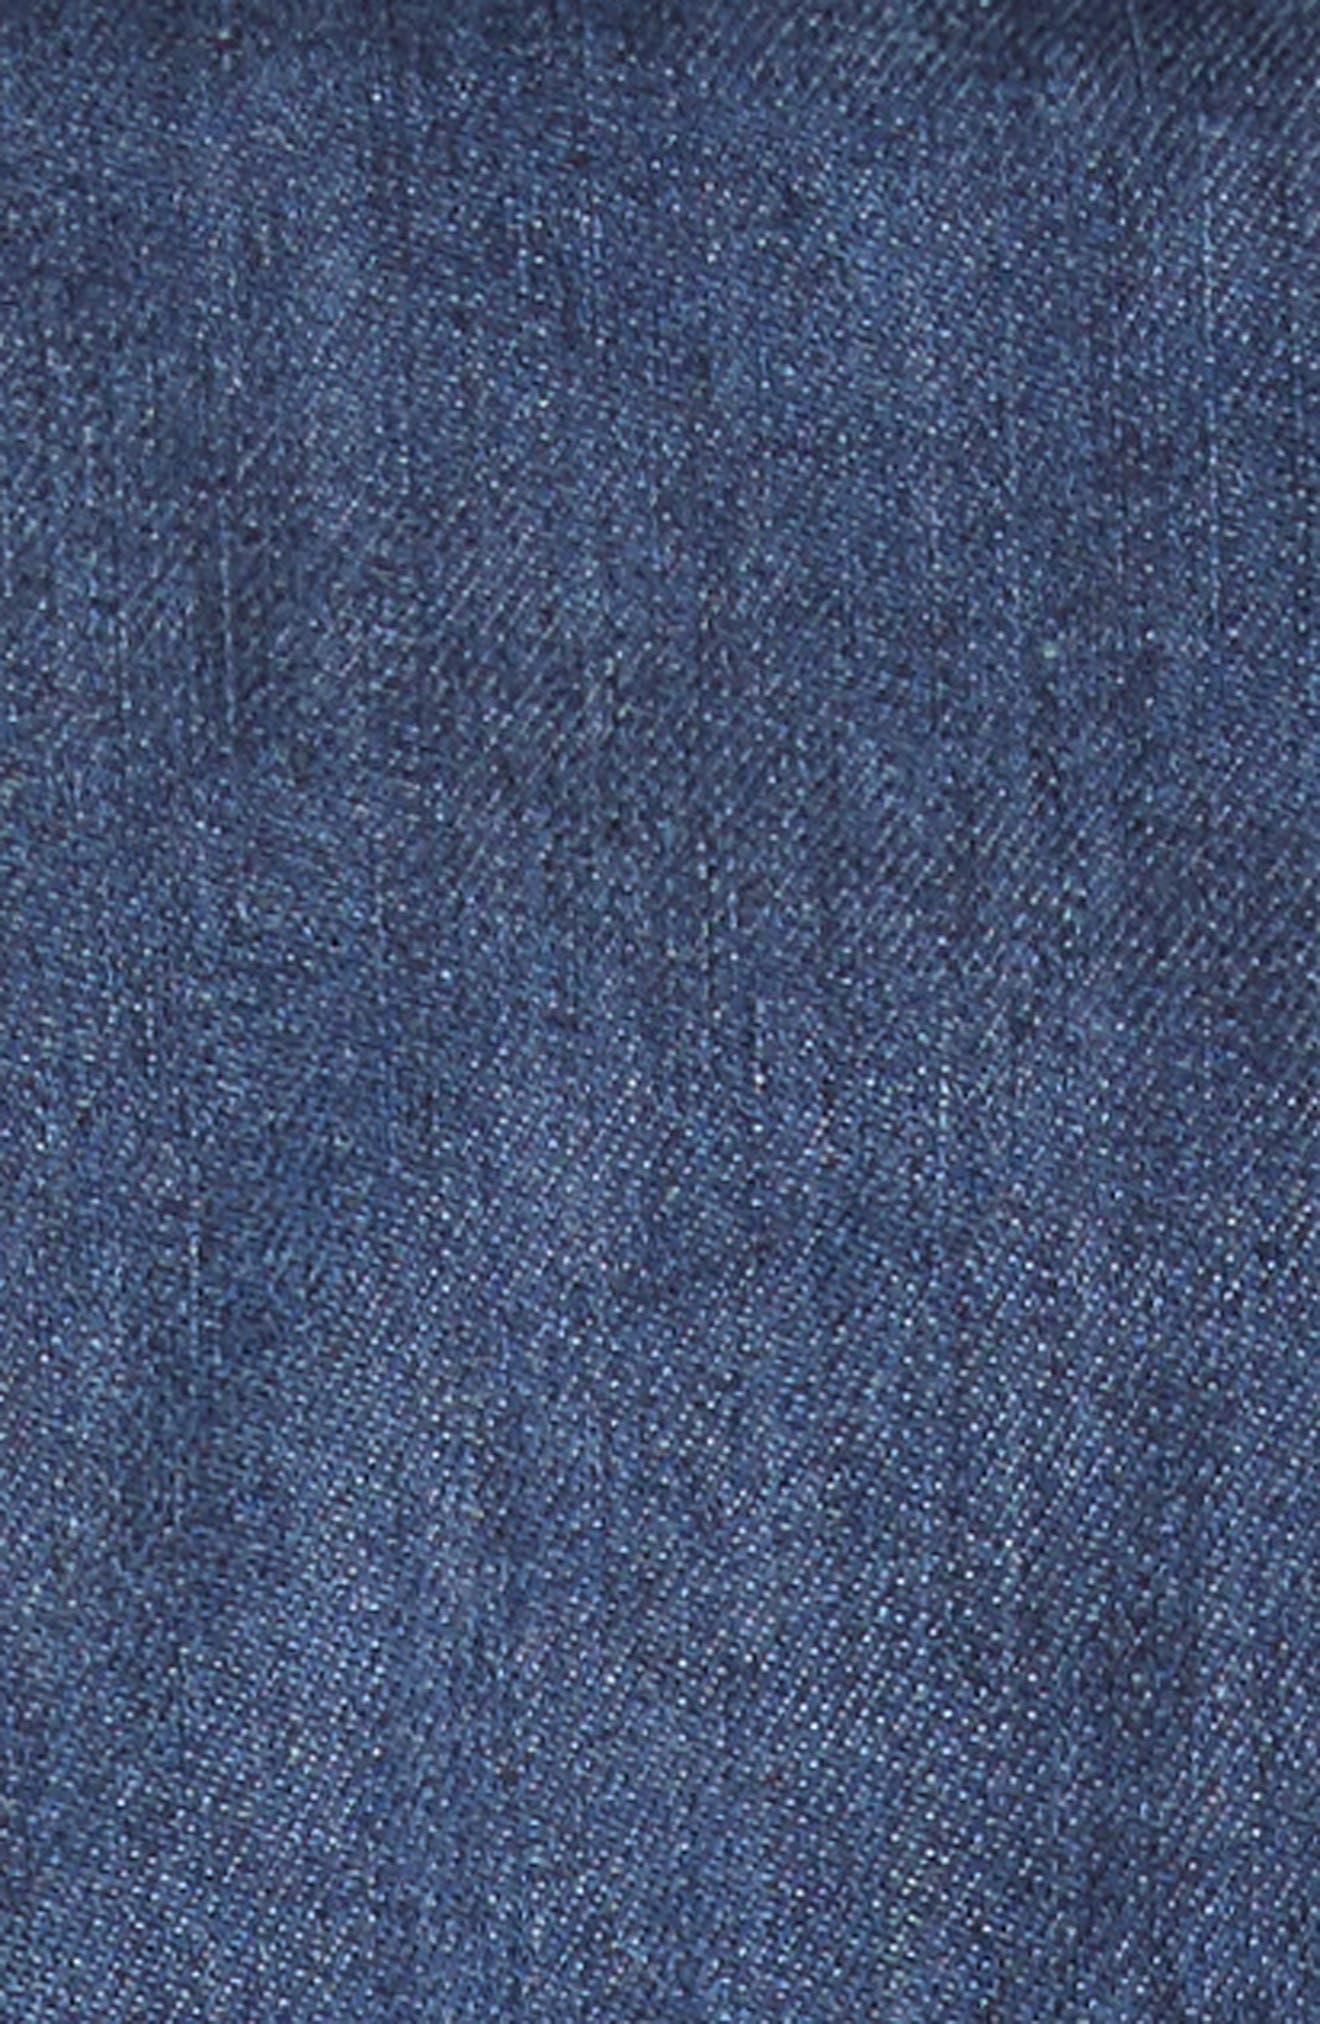 Ruched Denim Midi Dress,                             Alternate thumbnail 7, color,                             Dark Blue